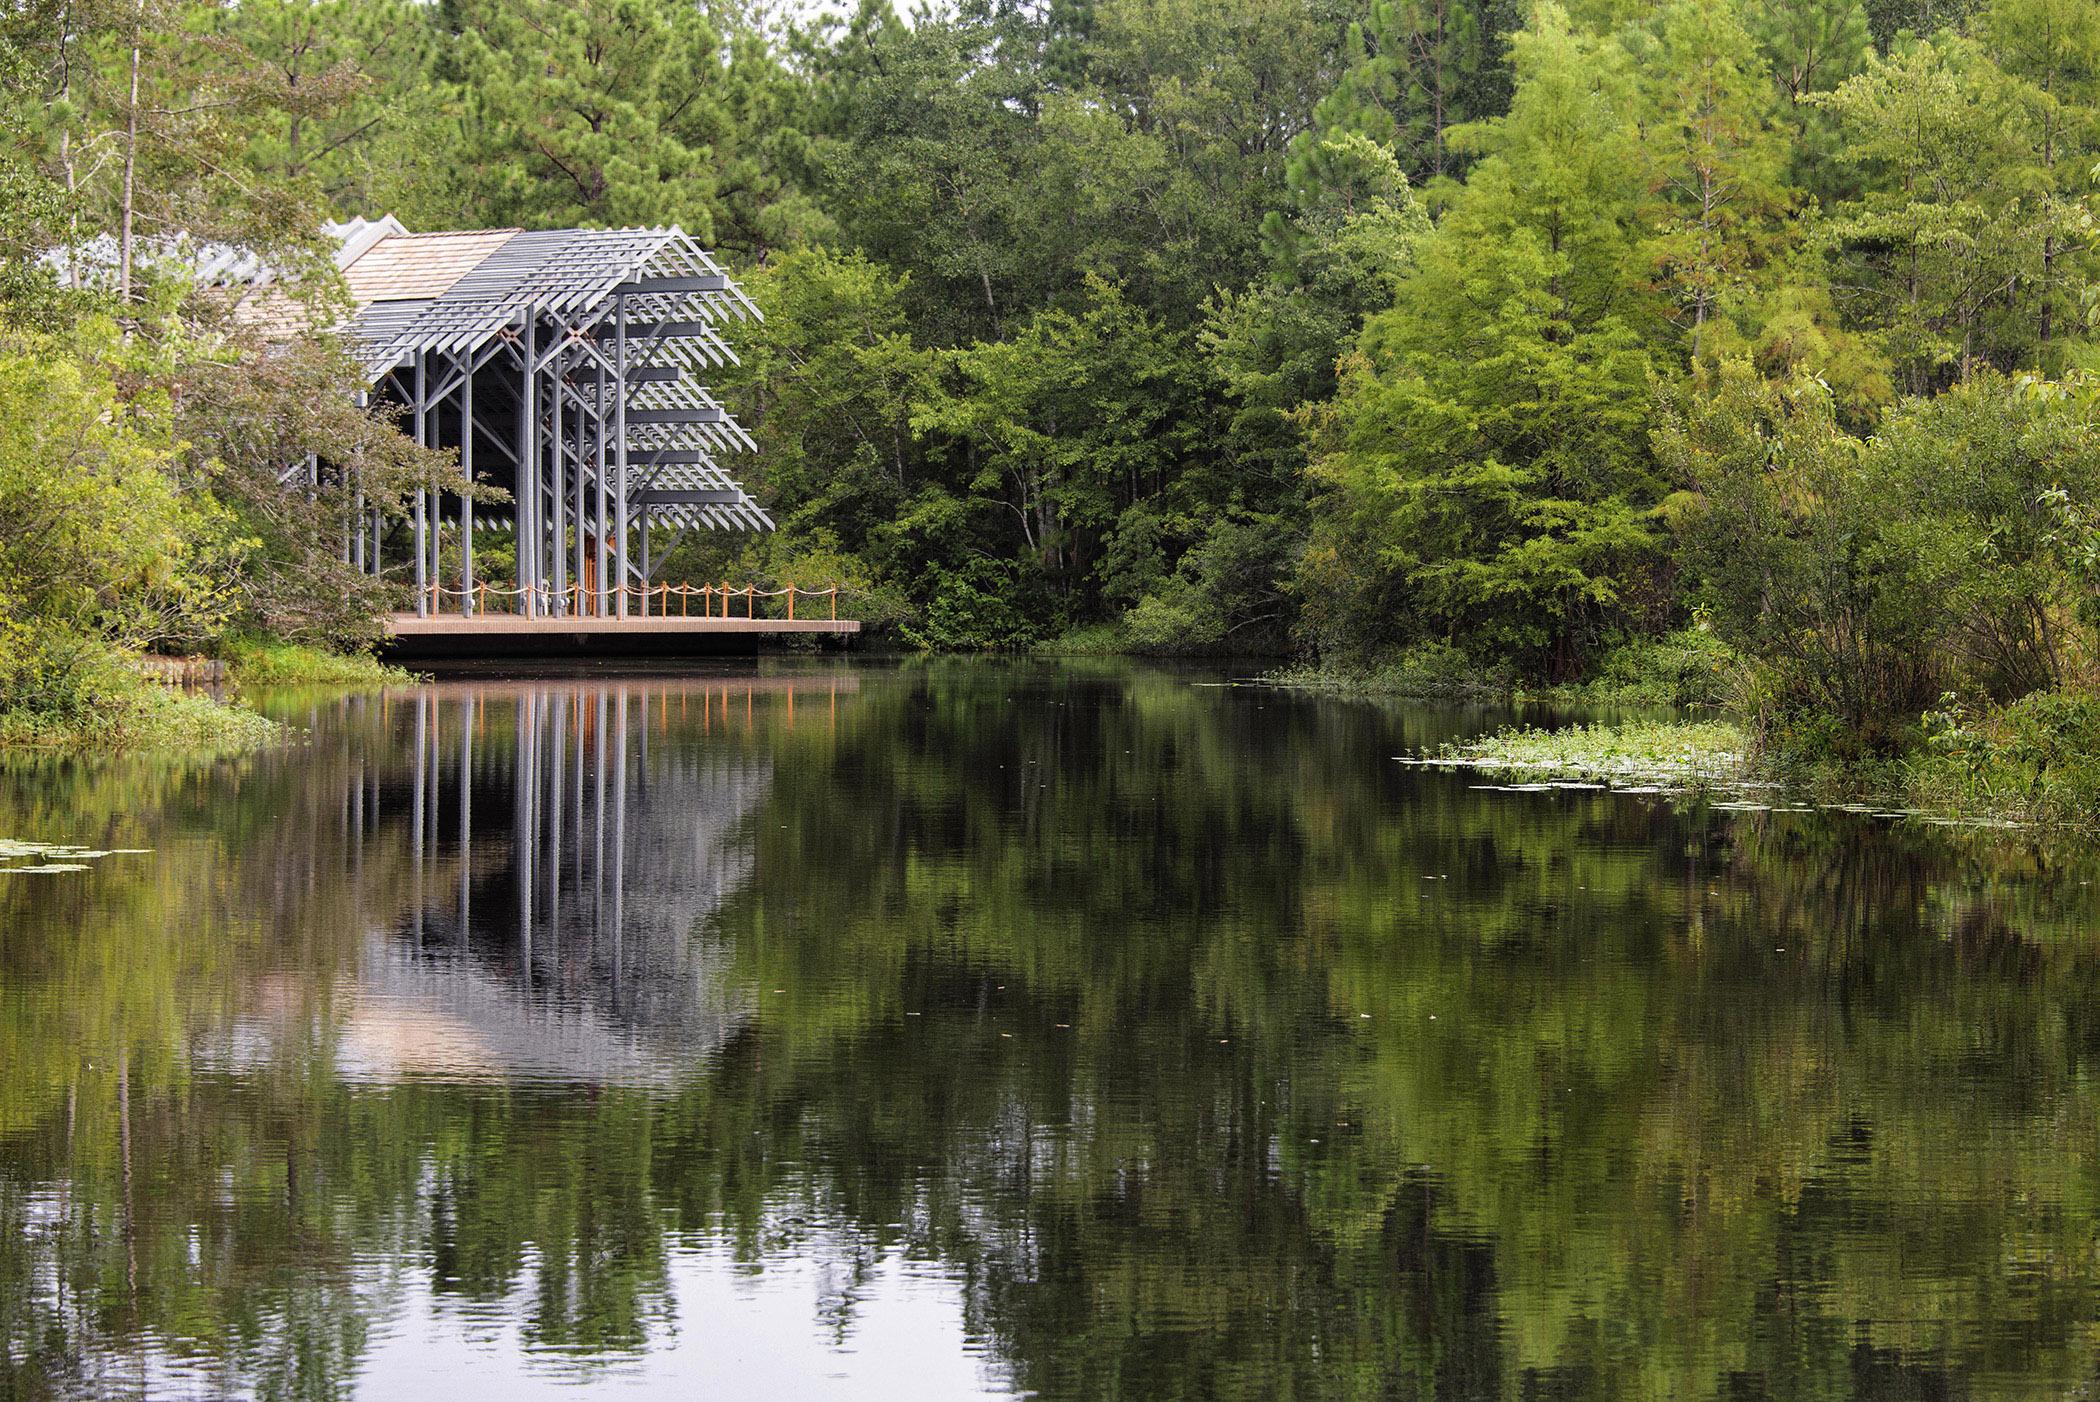 Crosby arboretum marks 20 year msu partnership - Garden state veterinary services ...